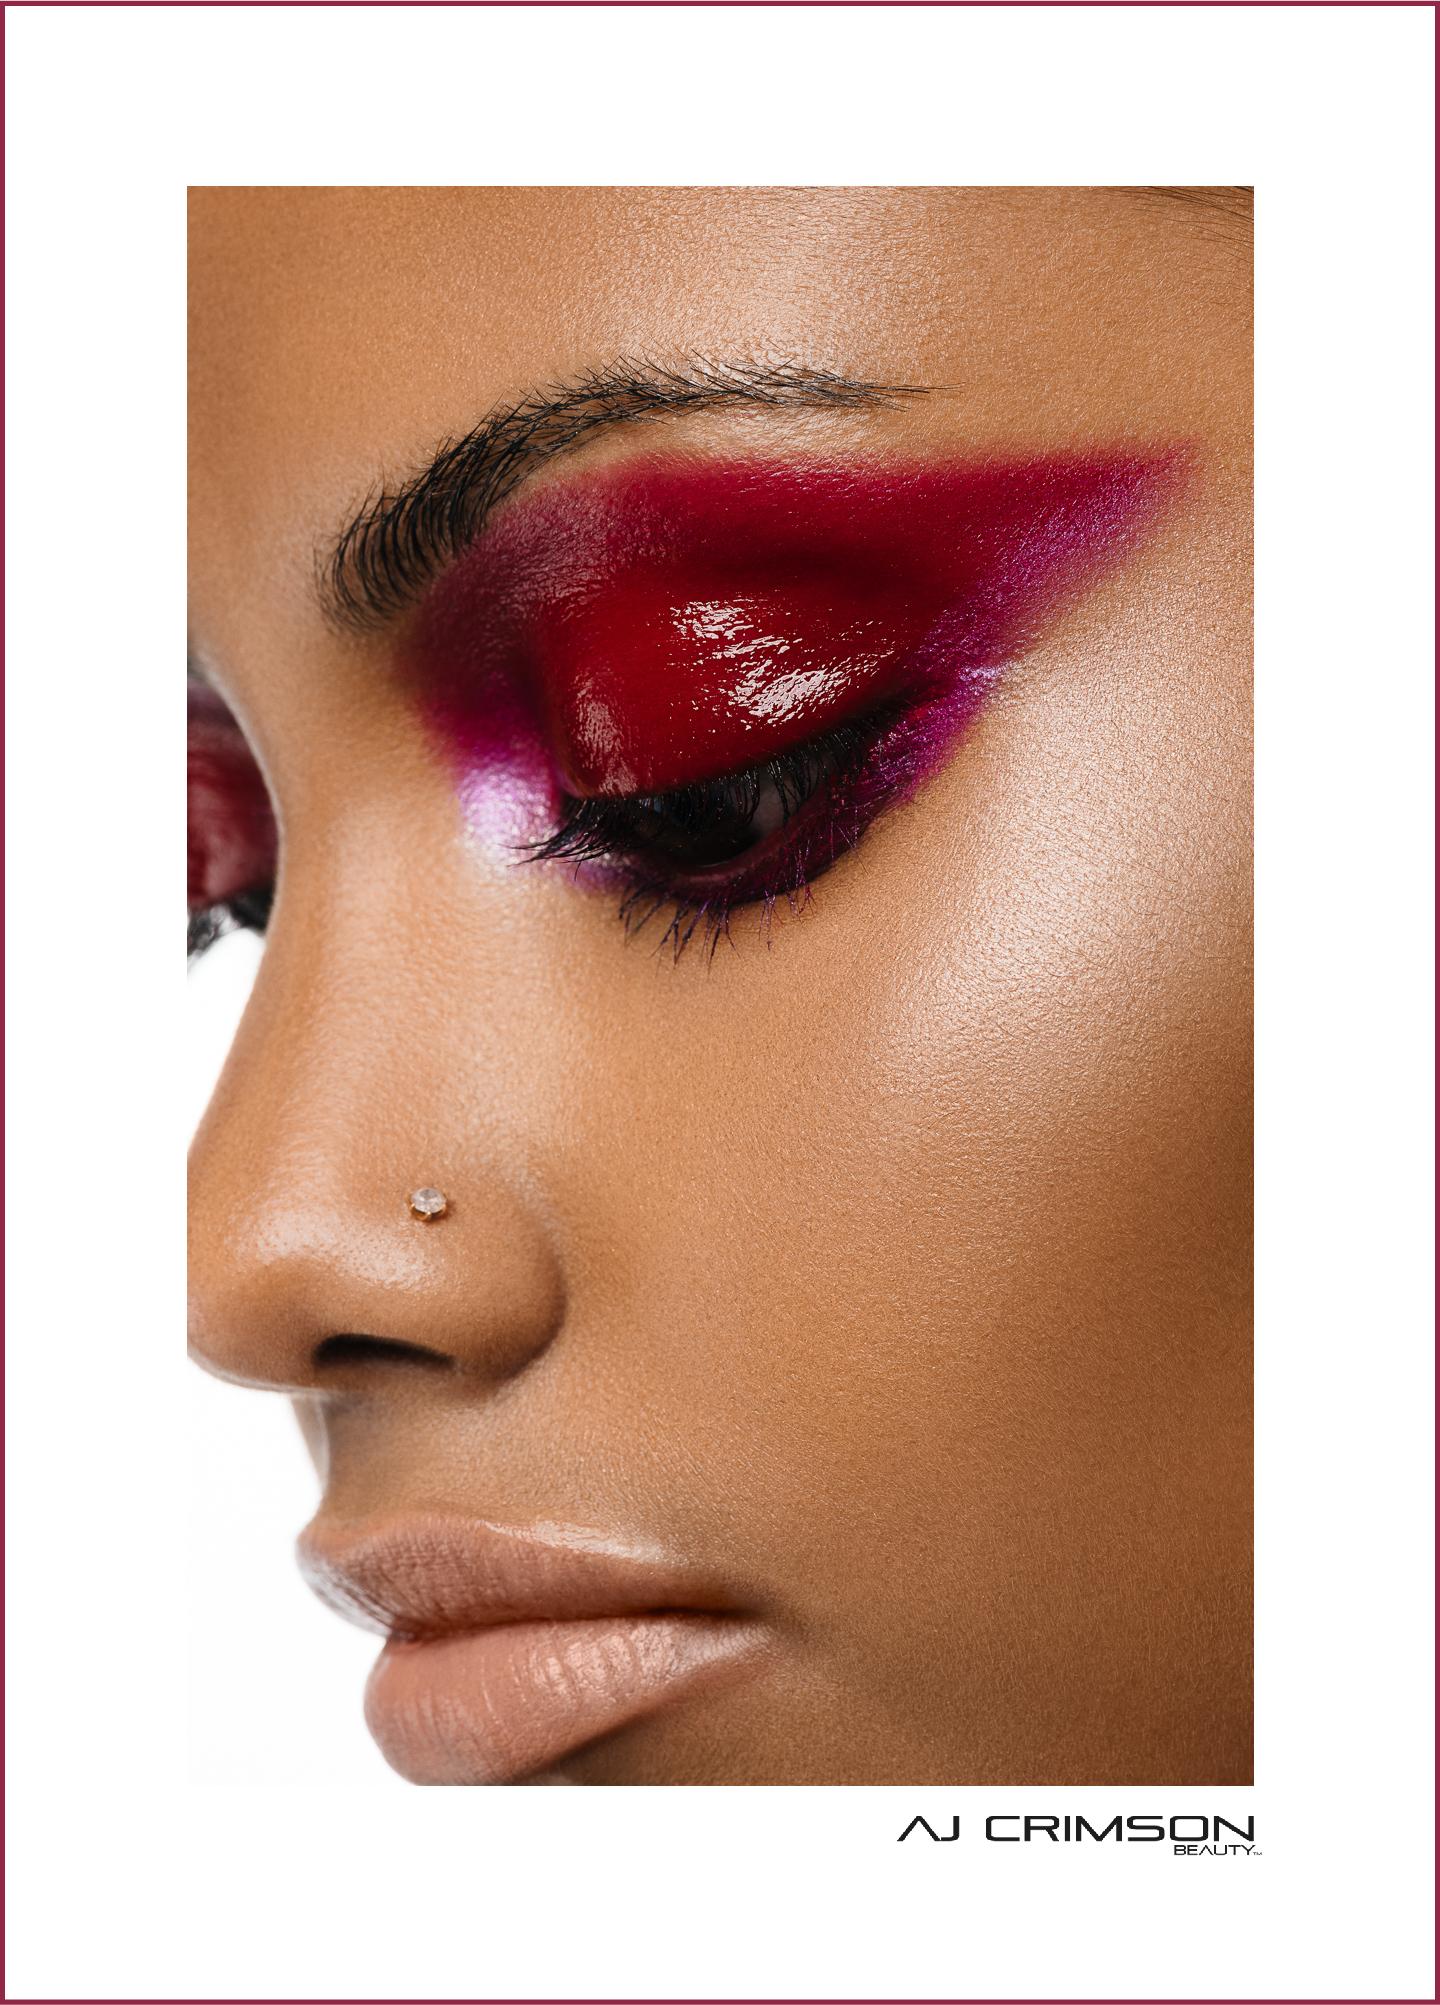 aj crimson beauty, 2019